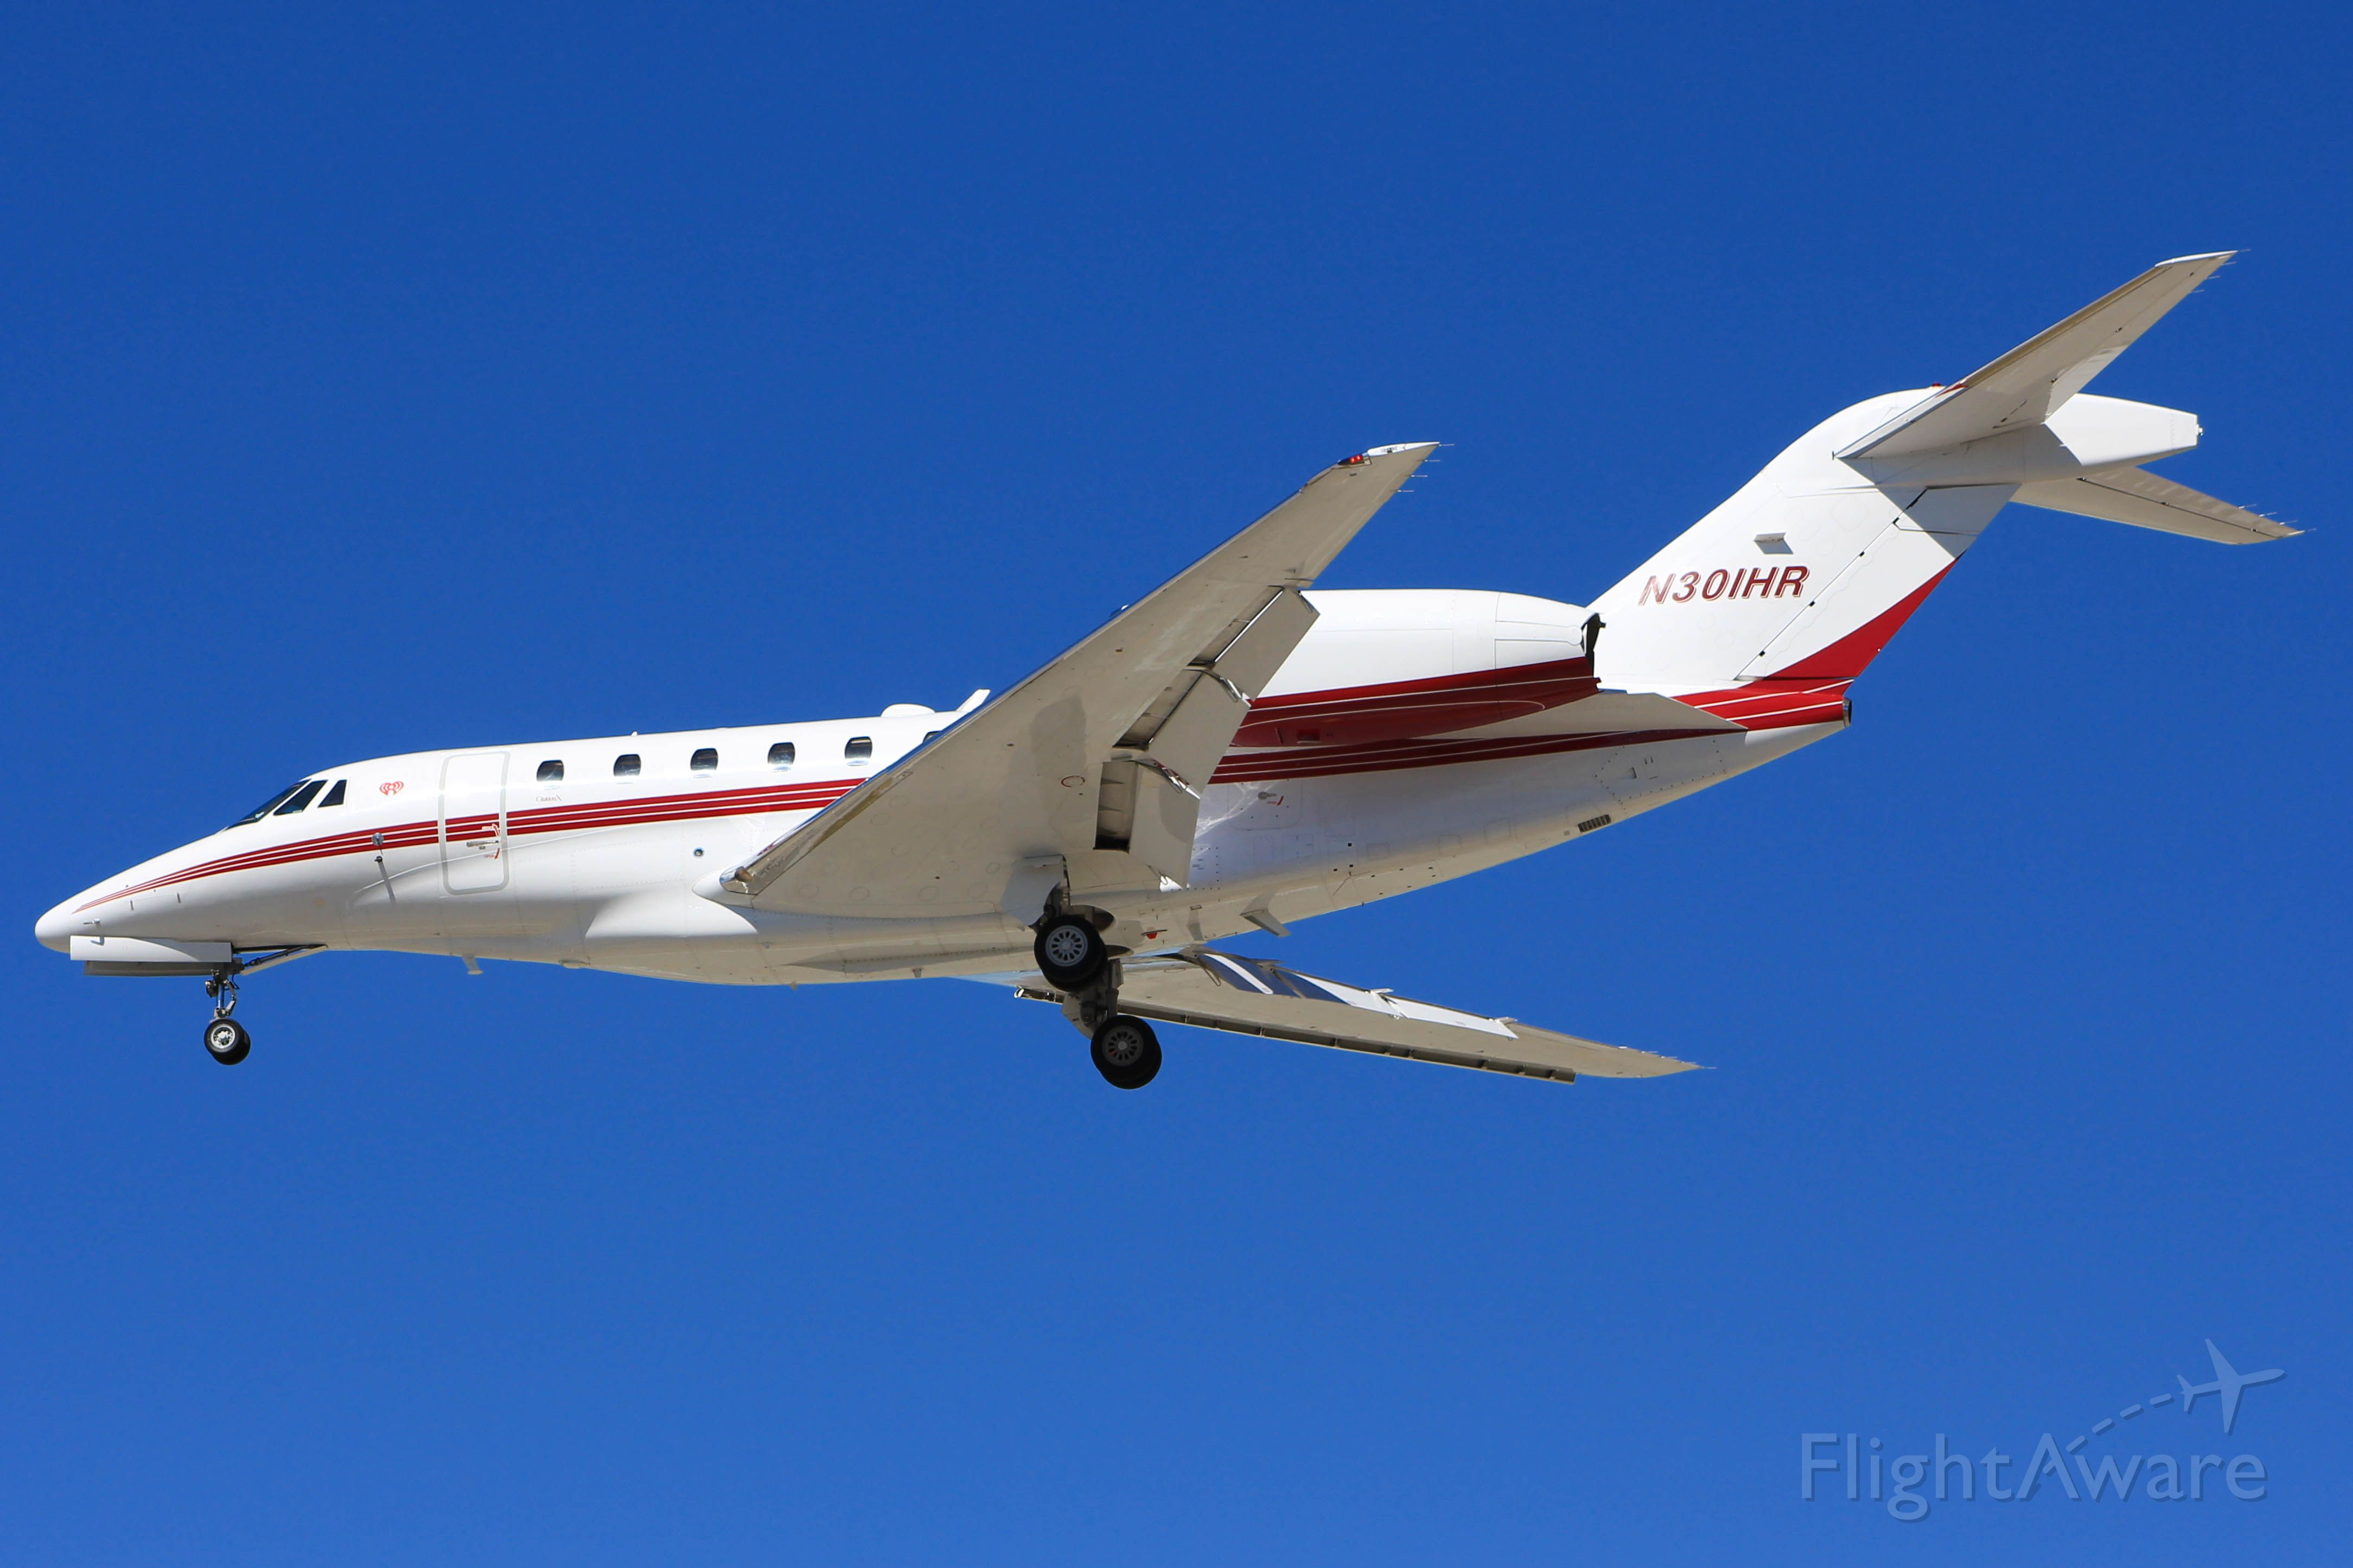 Cessna Citation X (N301HR)